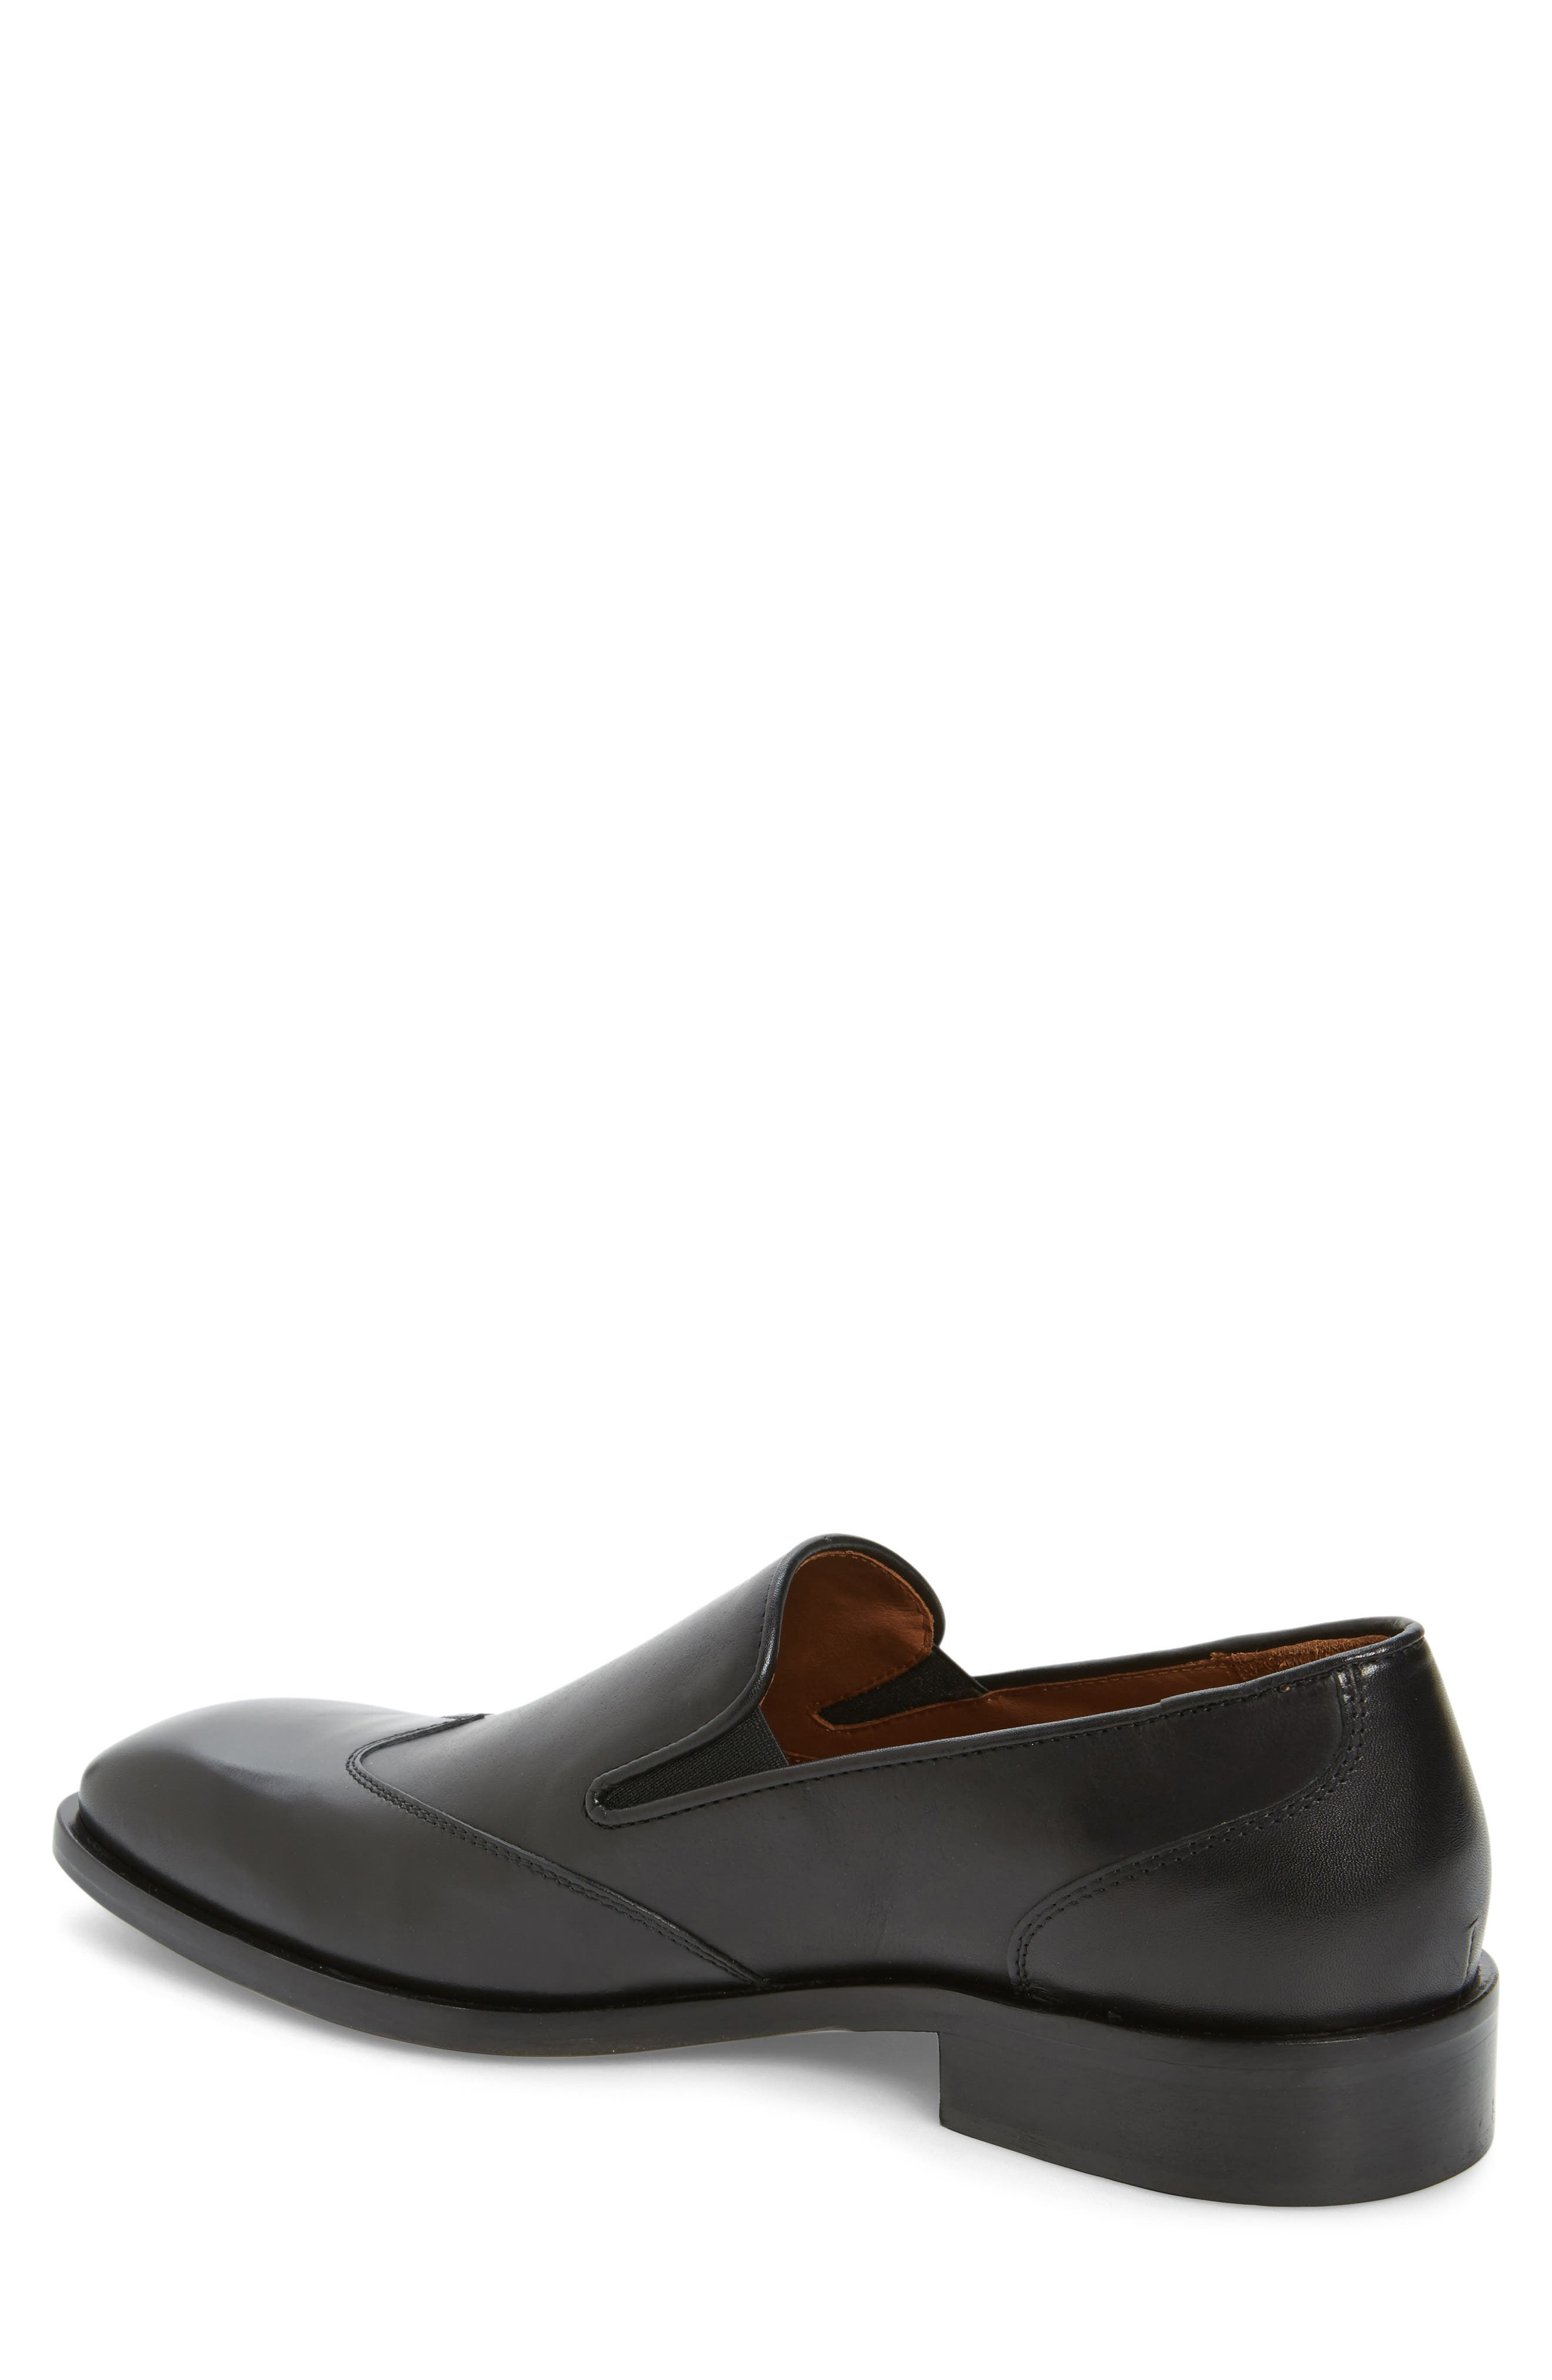 Valente Venetian Loafer,                             Alternate thumbnail 2, color,                             Black Leather